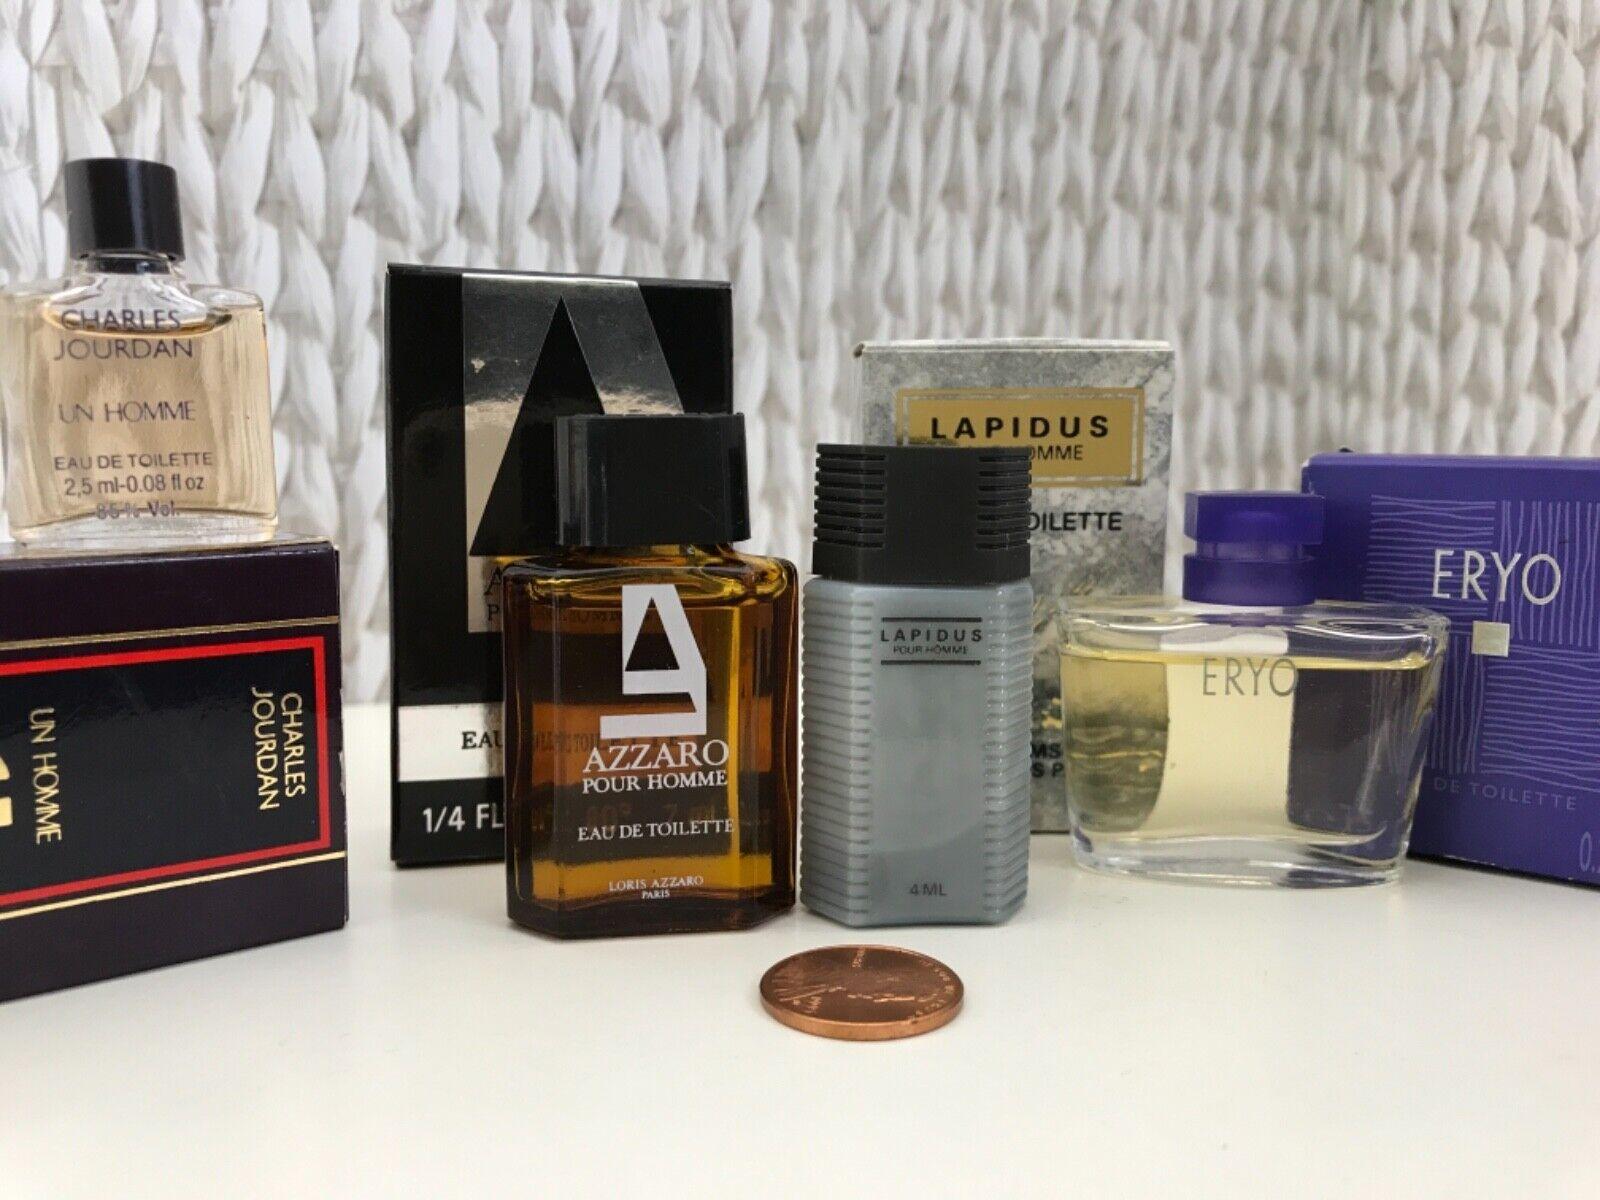 VTG Lot Of 4 Men s MINI Sample Perfumes CHARLES JOURDAN, LAPIDUS, ERYO, AZZARO - $25.99